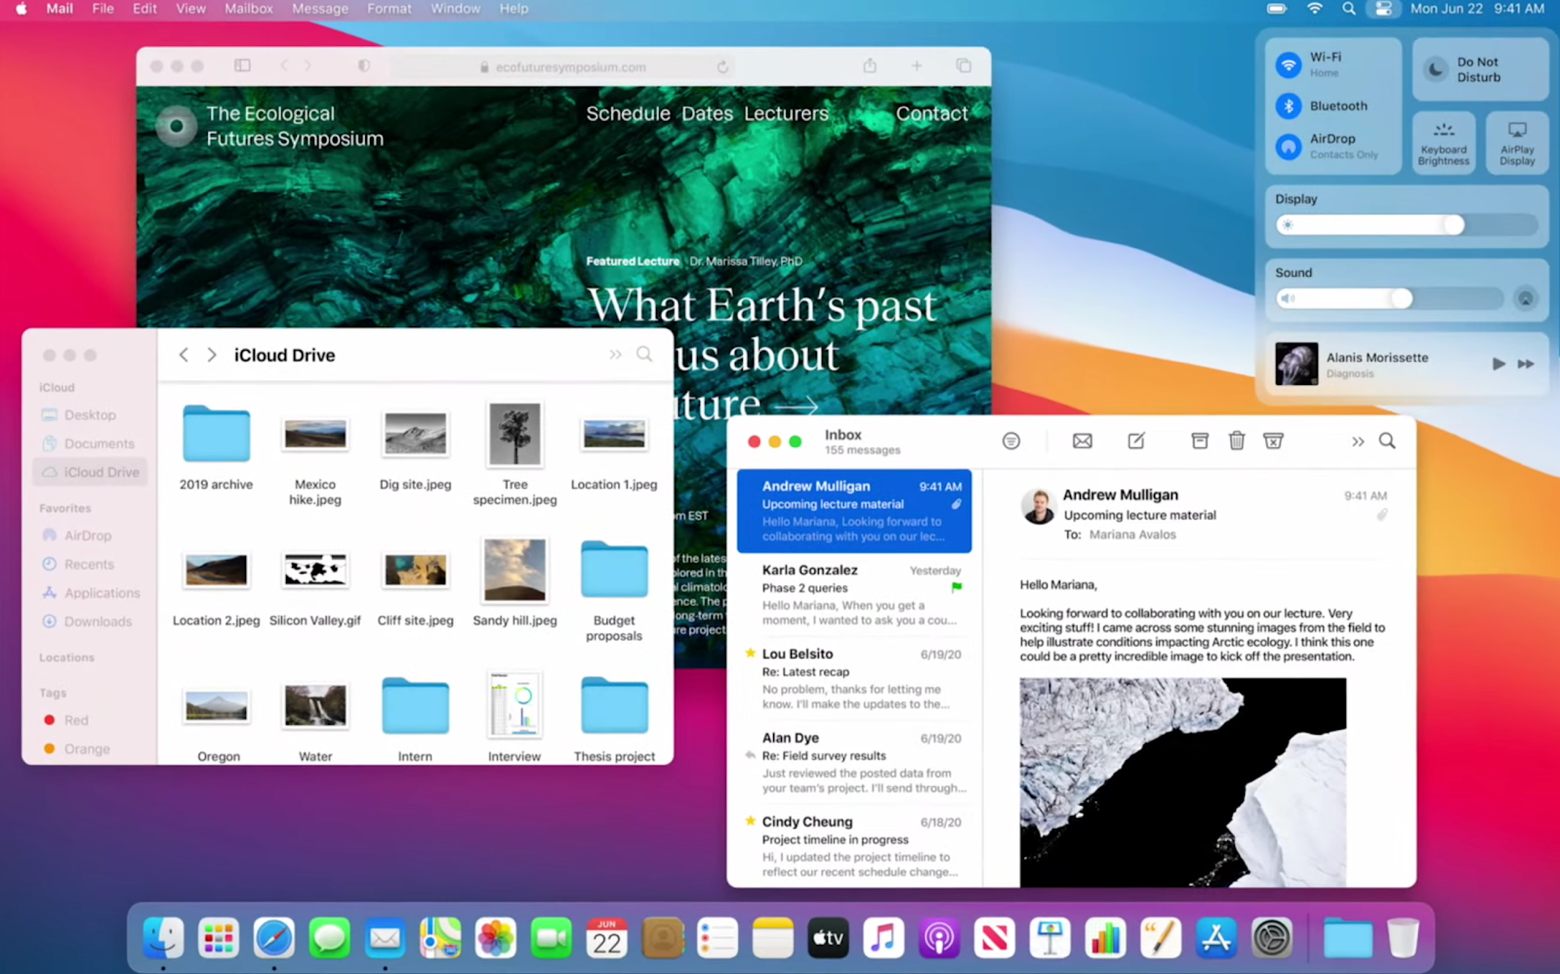 Apple Silicon M1 Mac iOS apps